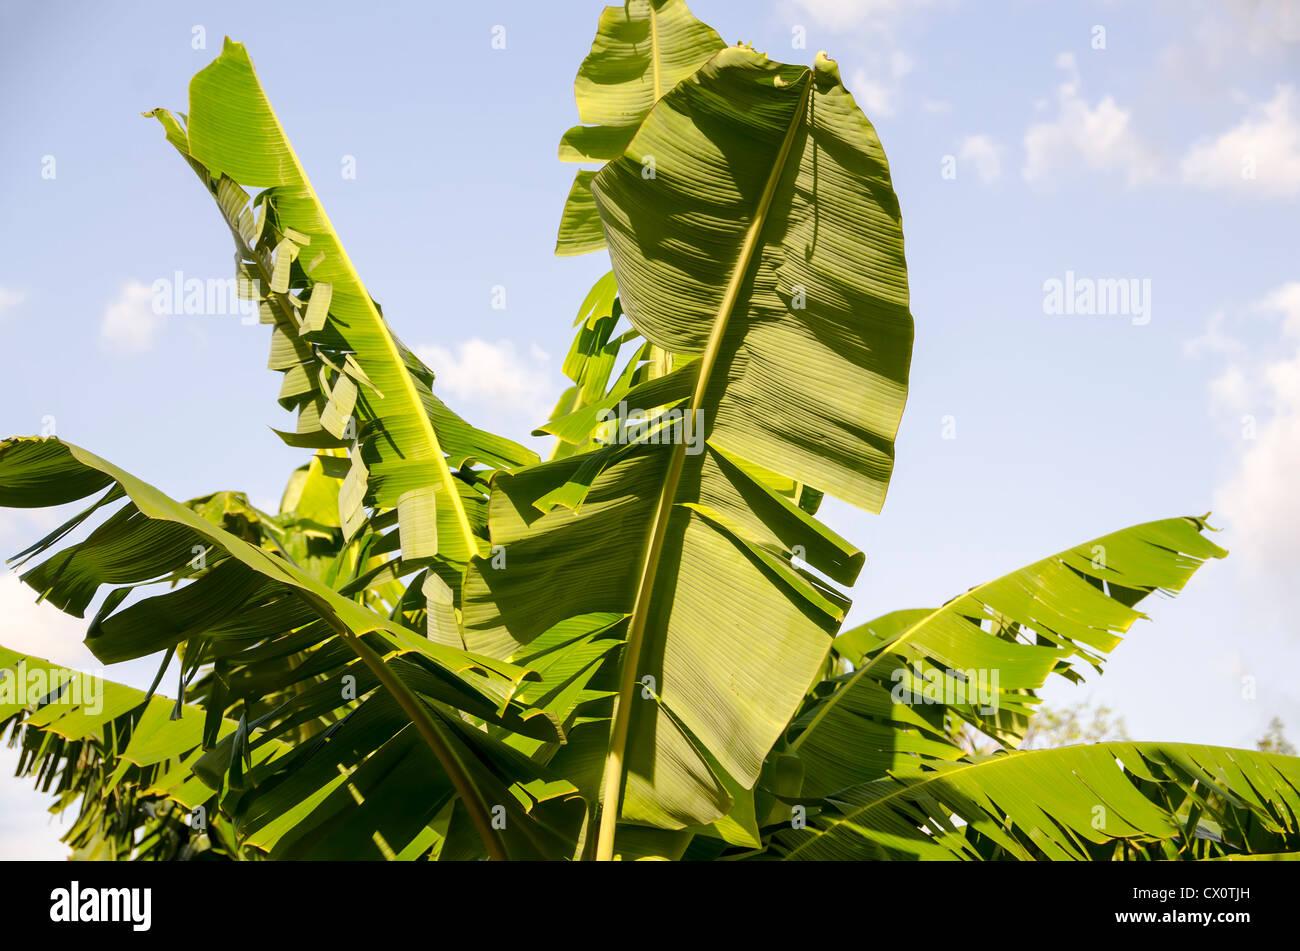 Closeup green banana leaves against blue sky nobody wop - Stock Image